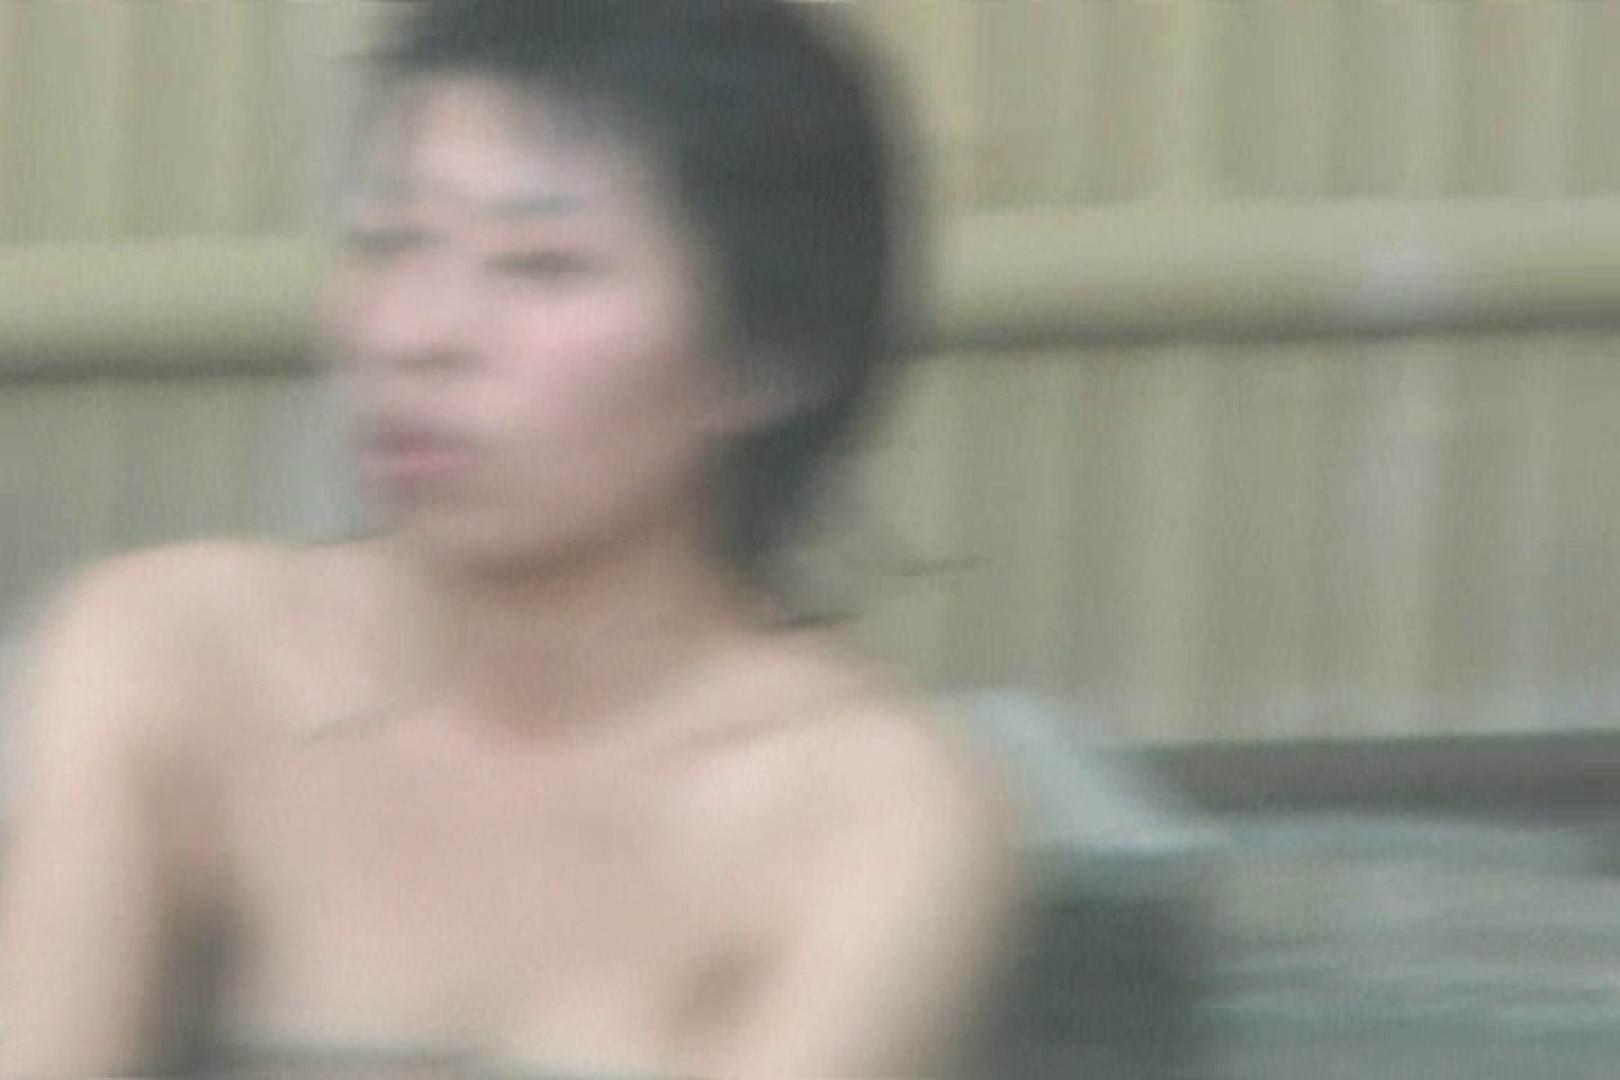 Aquaな露天風呂Vol.589 盗撮シリーズ | 露天風呂編  113PIX 73